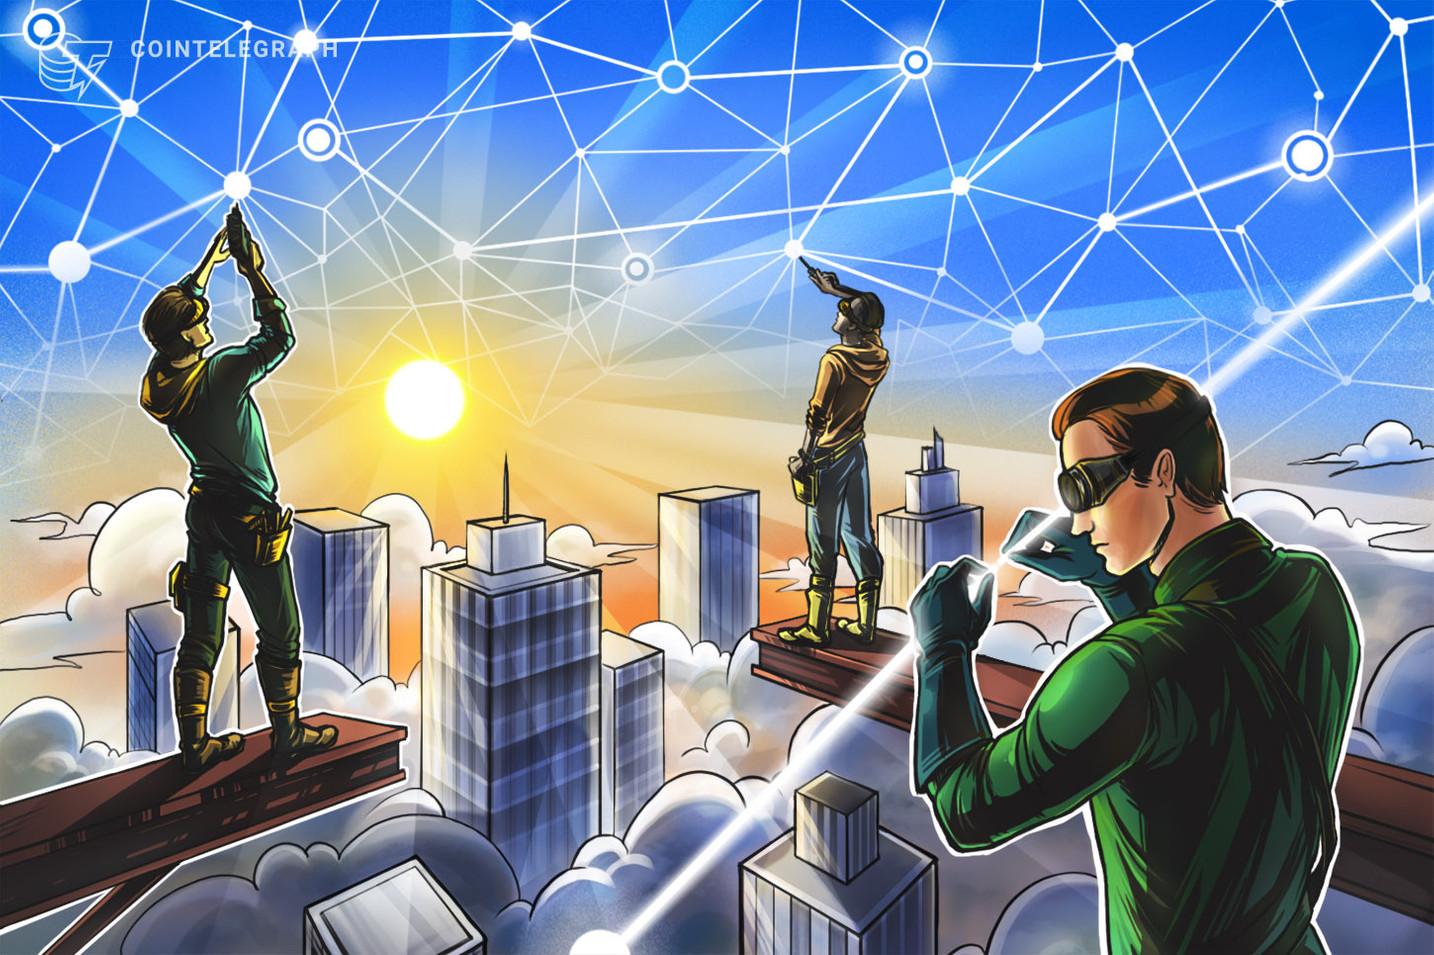 Inside the blockchain developer's mind: Koinos approaches testnet